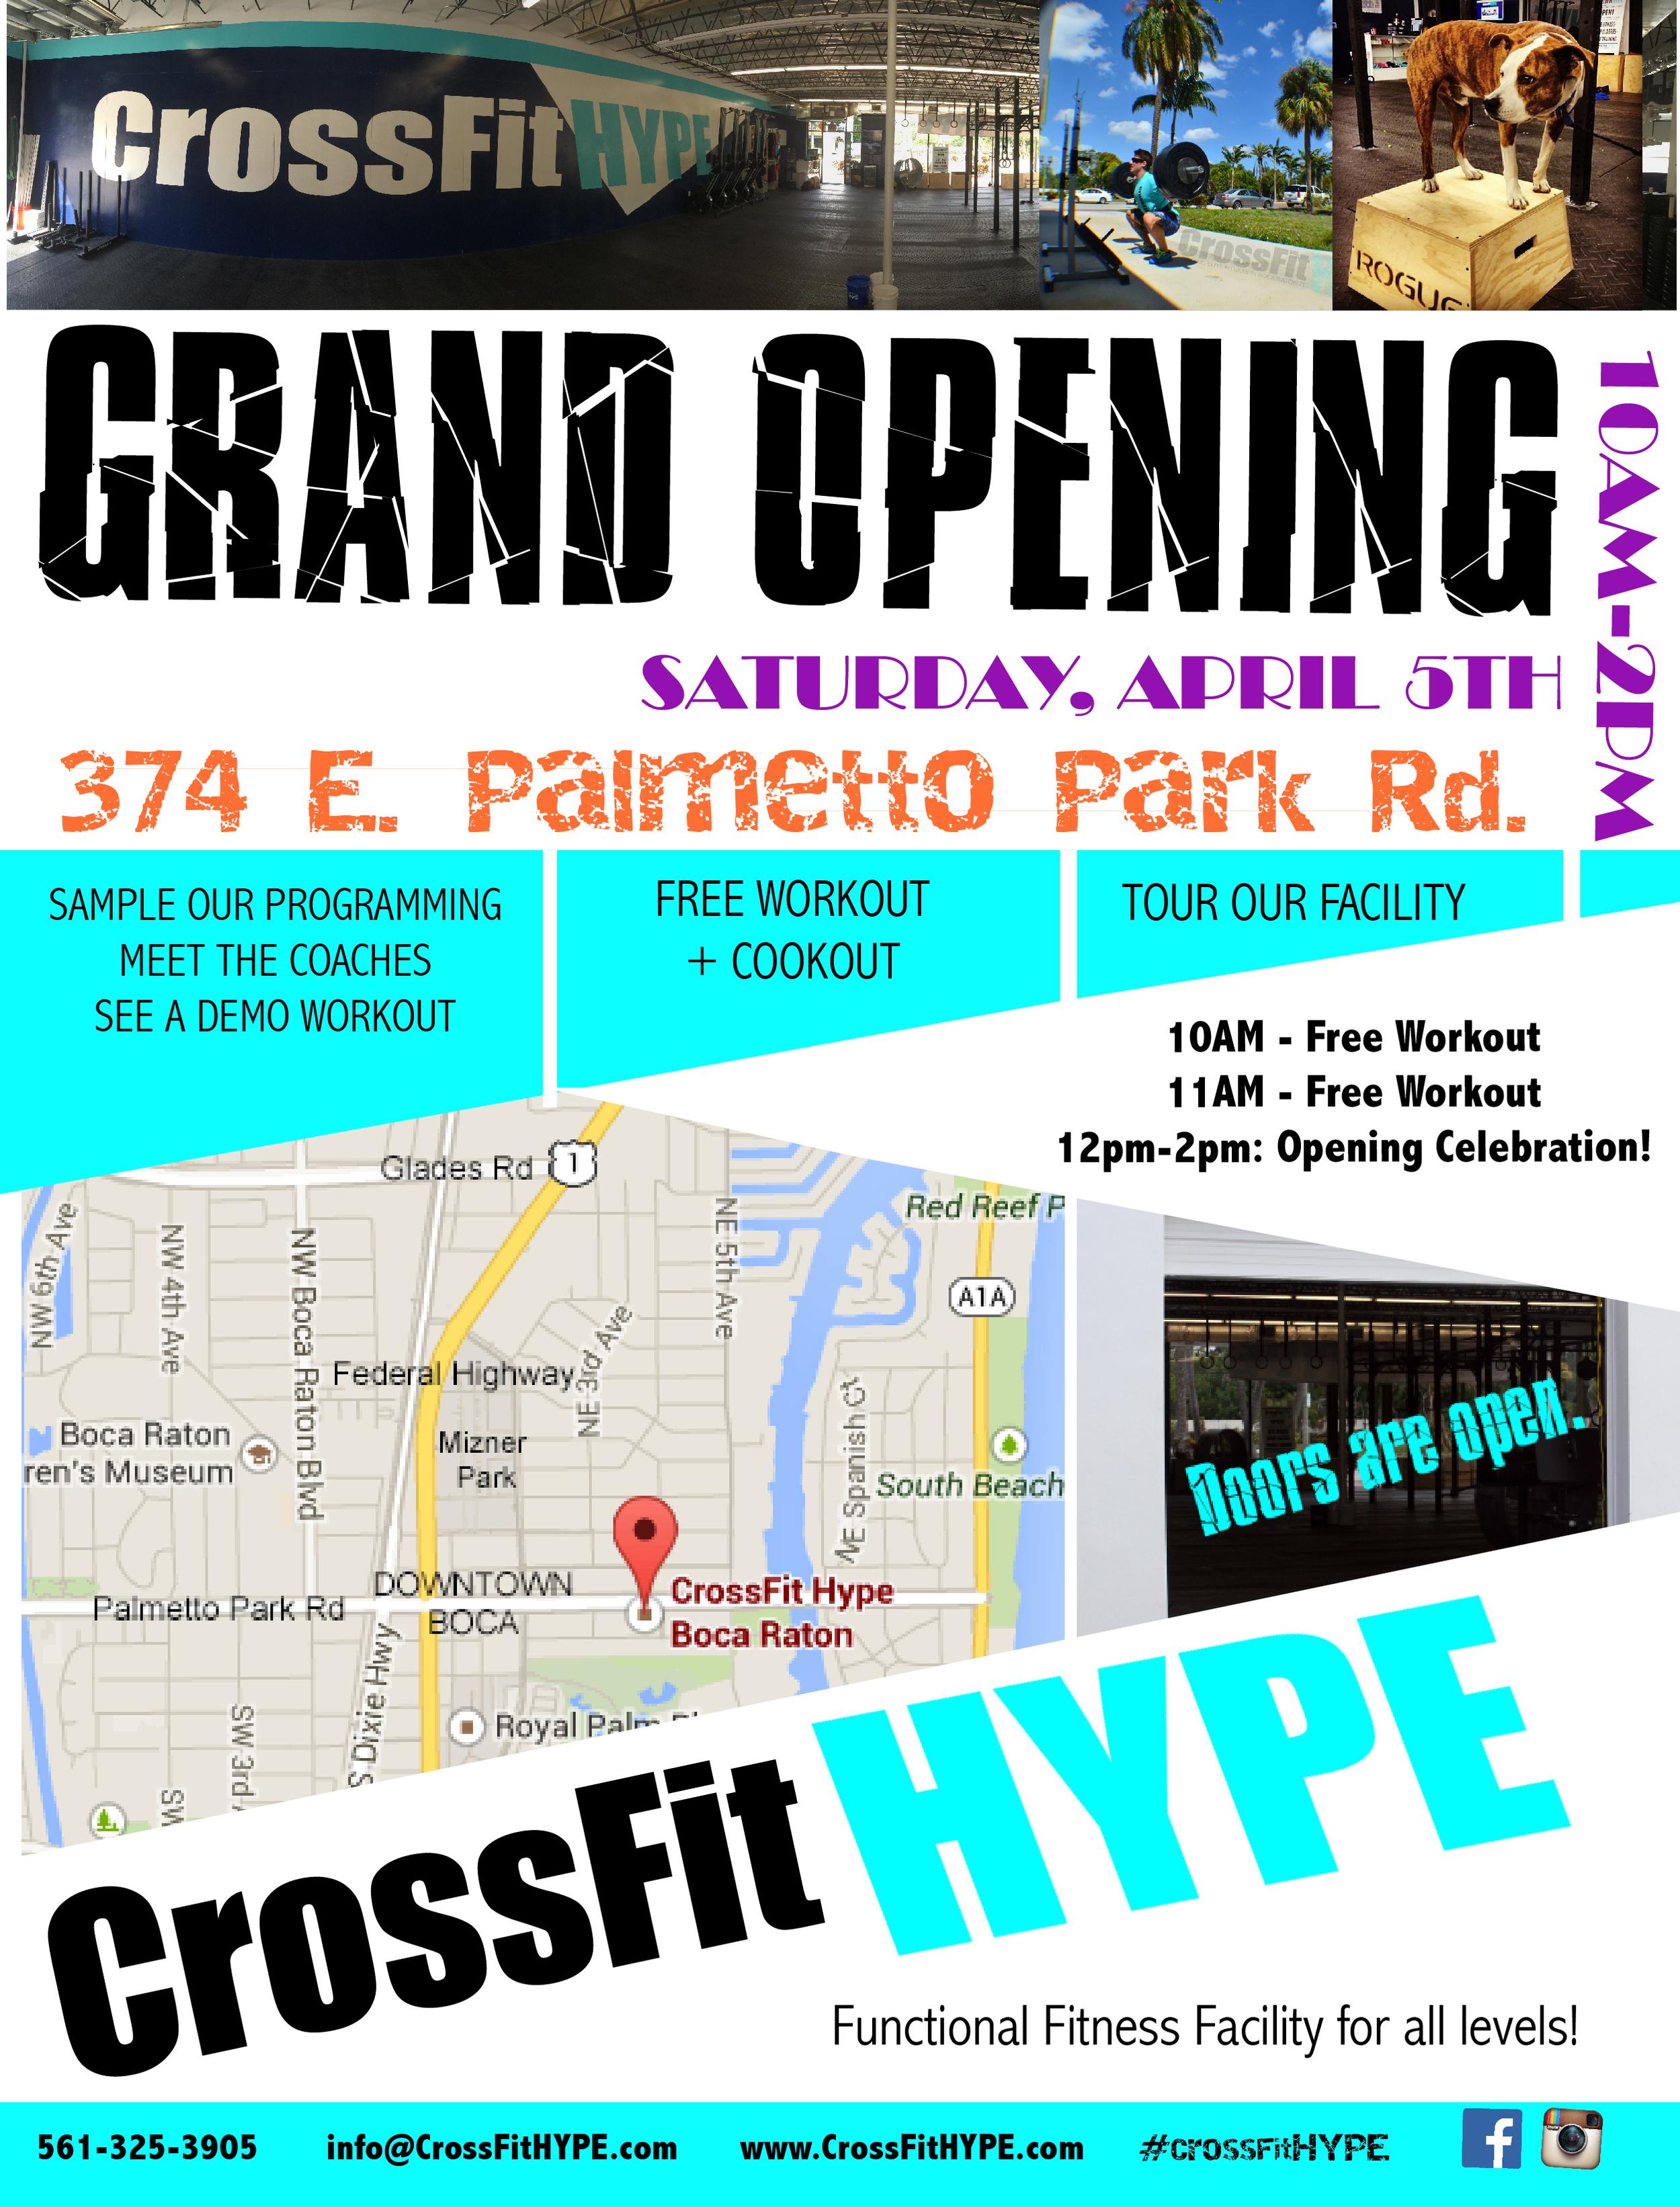 CrossFit HYPE, East Boca Raton's premier fitness facility.